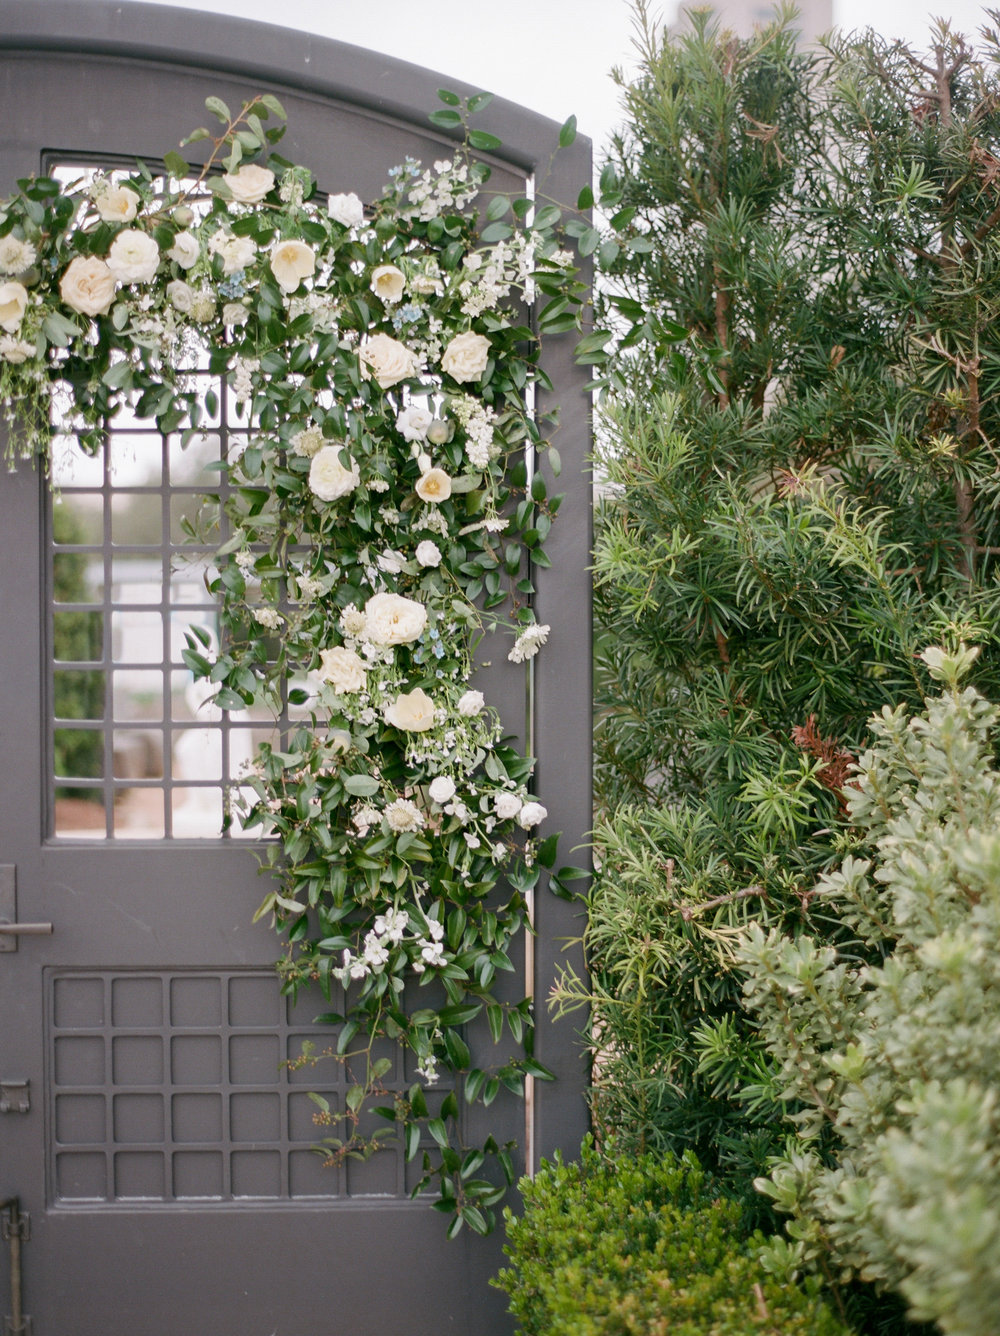 McGovern-Centennial-Gardens-Houston-Texas-Wedding-Venue-Josh-Dana-Fernandez-Photography-Film-Destination-Fine-Art-Luxury-Top-Best-Austin-Dallas-Magnolia-Rouge-Jennifer-Laura-Design-14.jpg